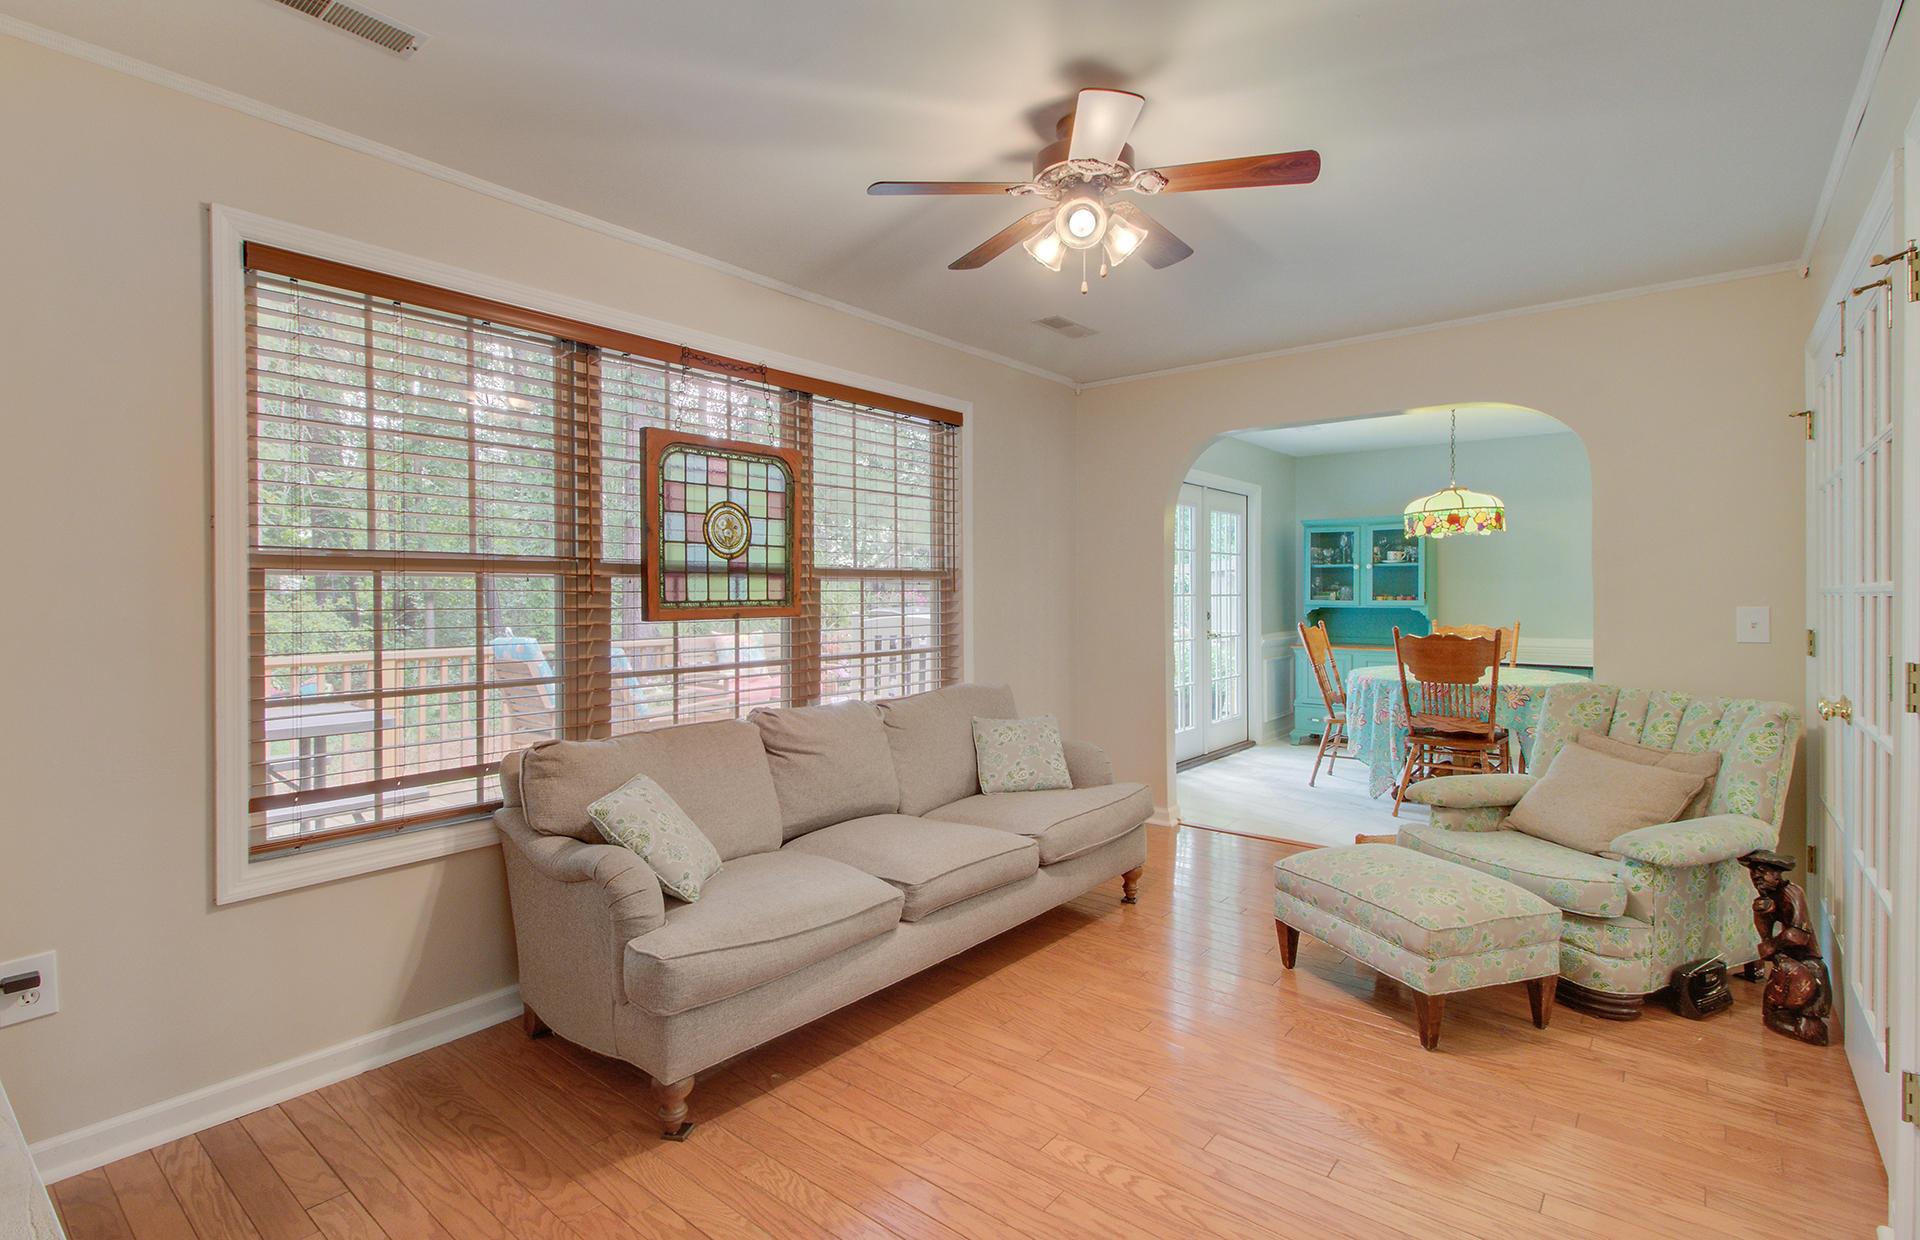 Park West Homes For Sale - 1500 Wellesley, Mount Pleasant, SC - 33